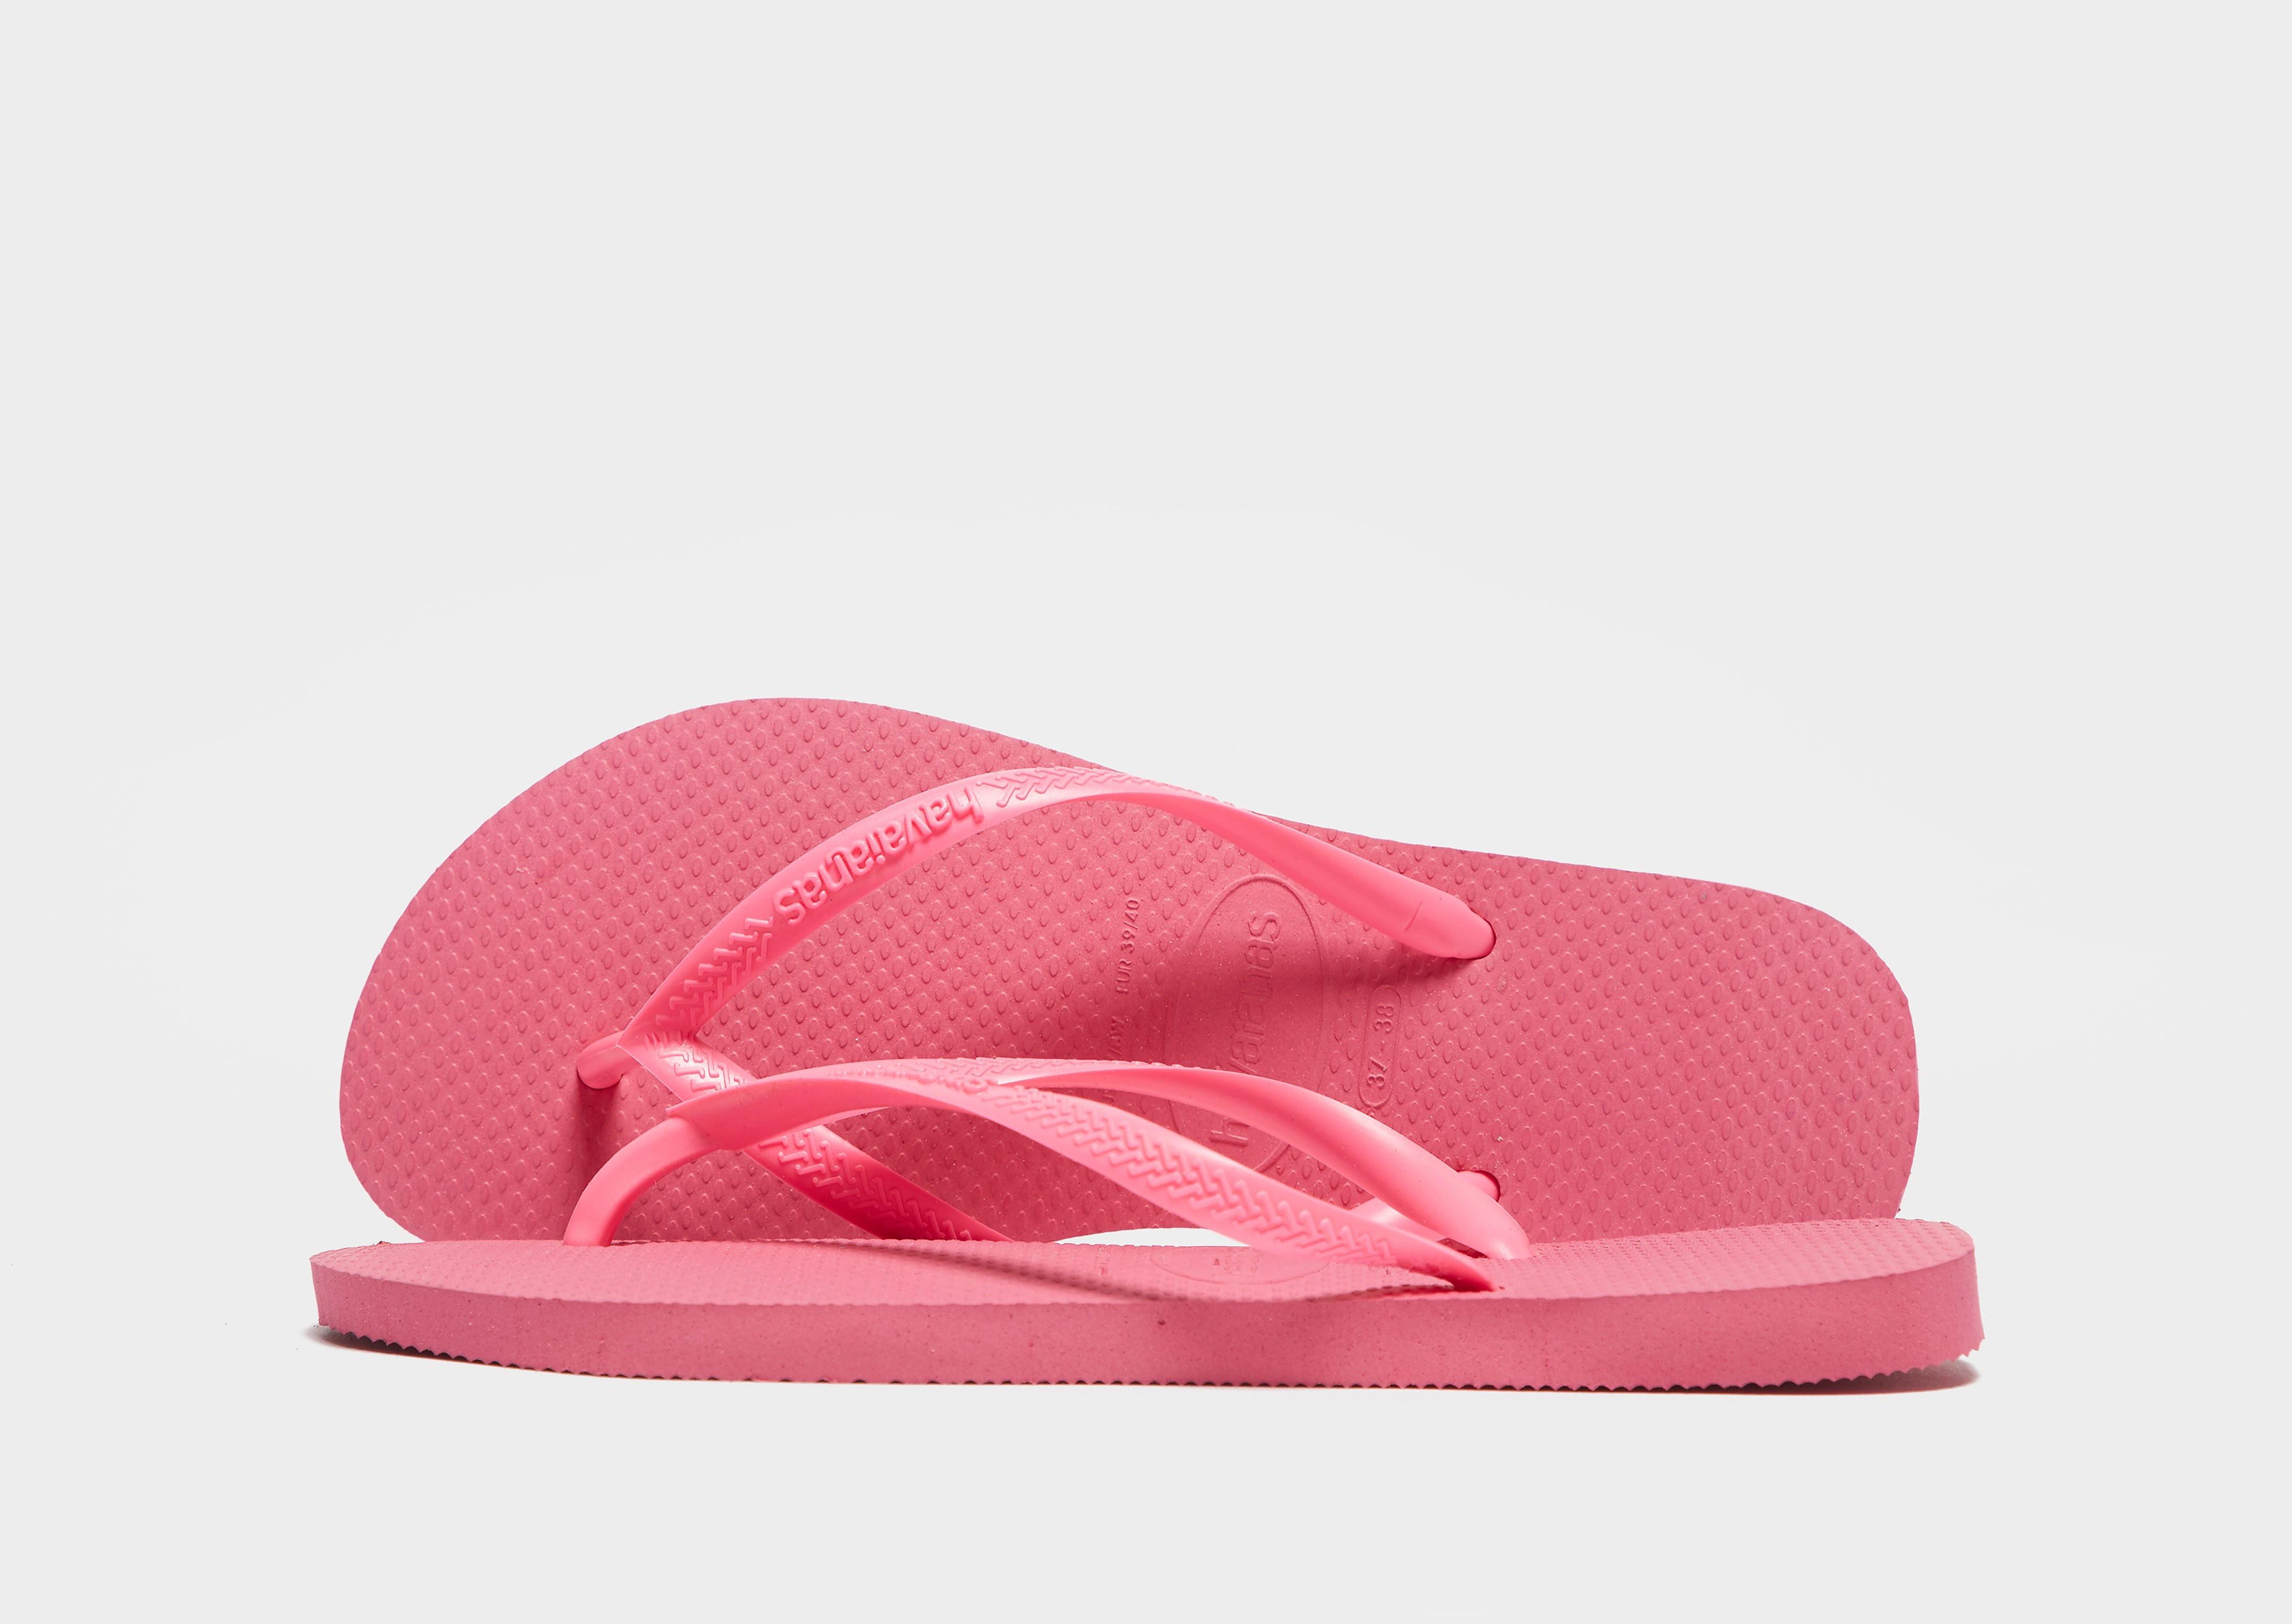 Havaianas Slim Flip Flop Women's